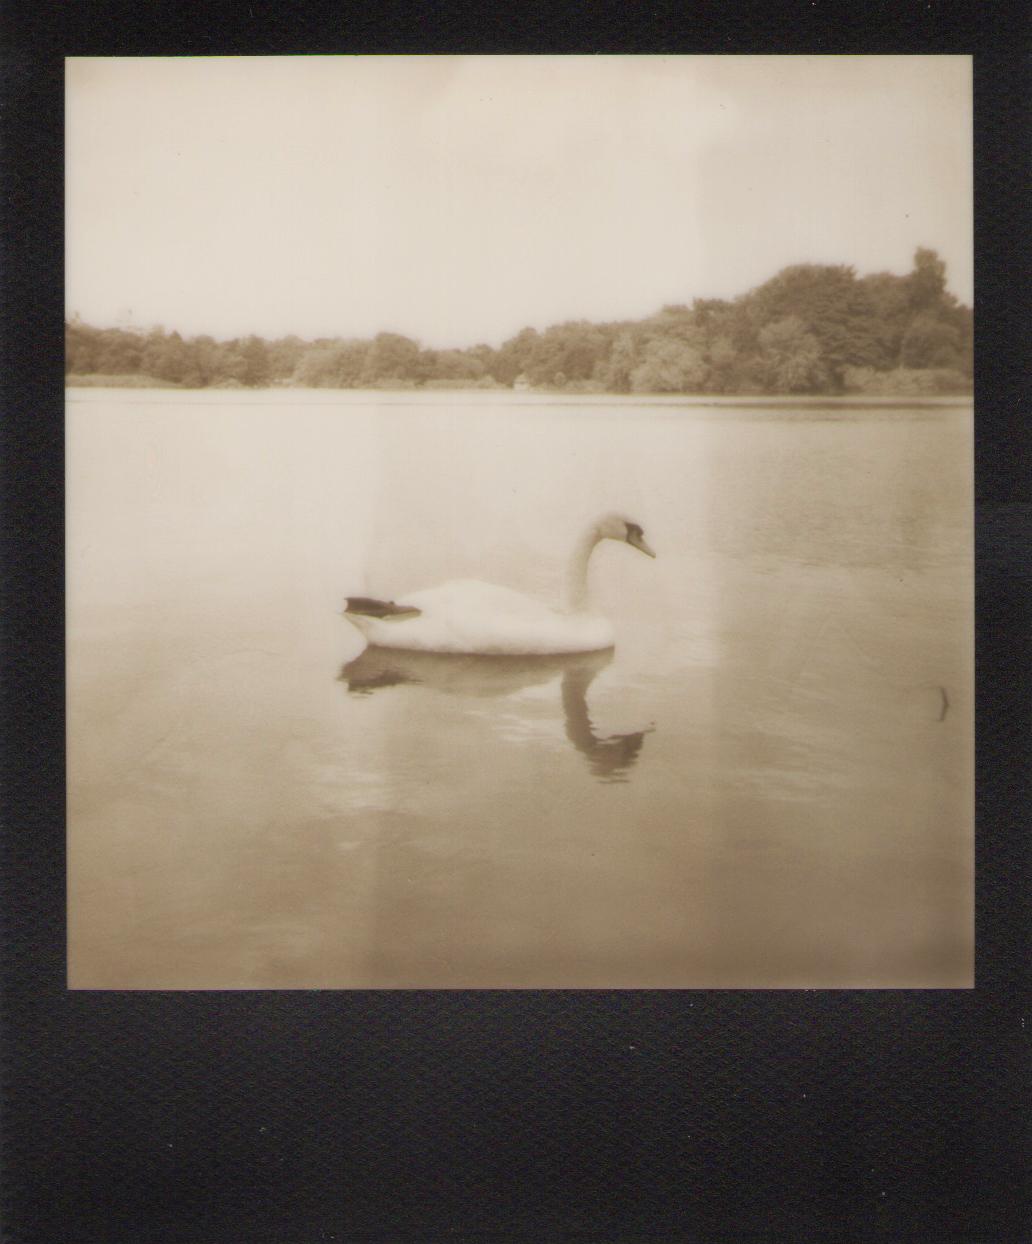 prospect park. 2012 expired polaroid